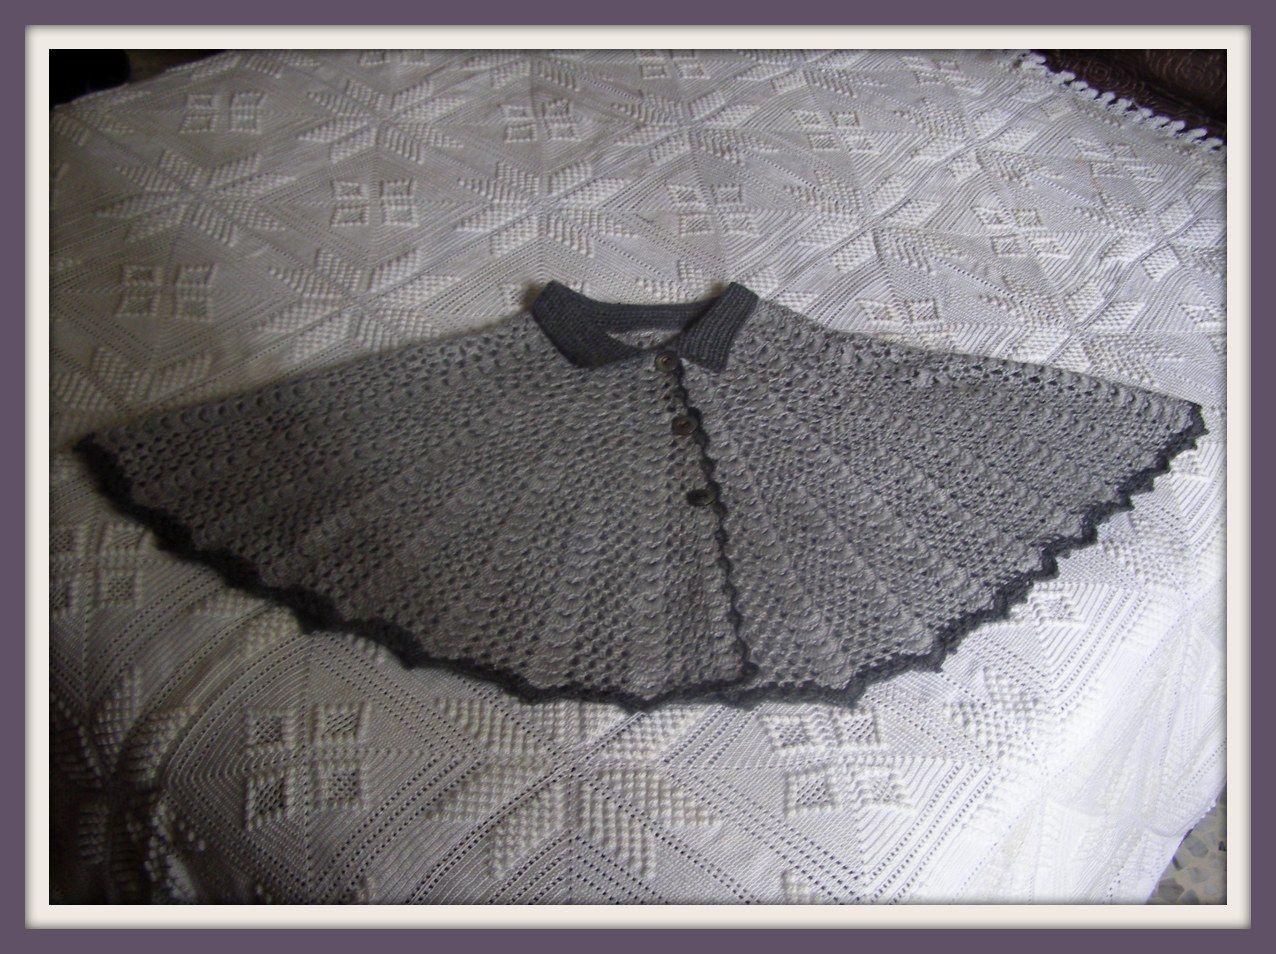 toquilla de abuela   COSAS DE AYER   Pinterest   Agujas de crochet ...